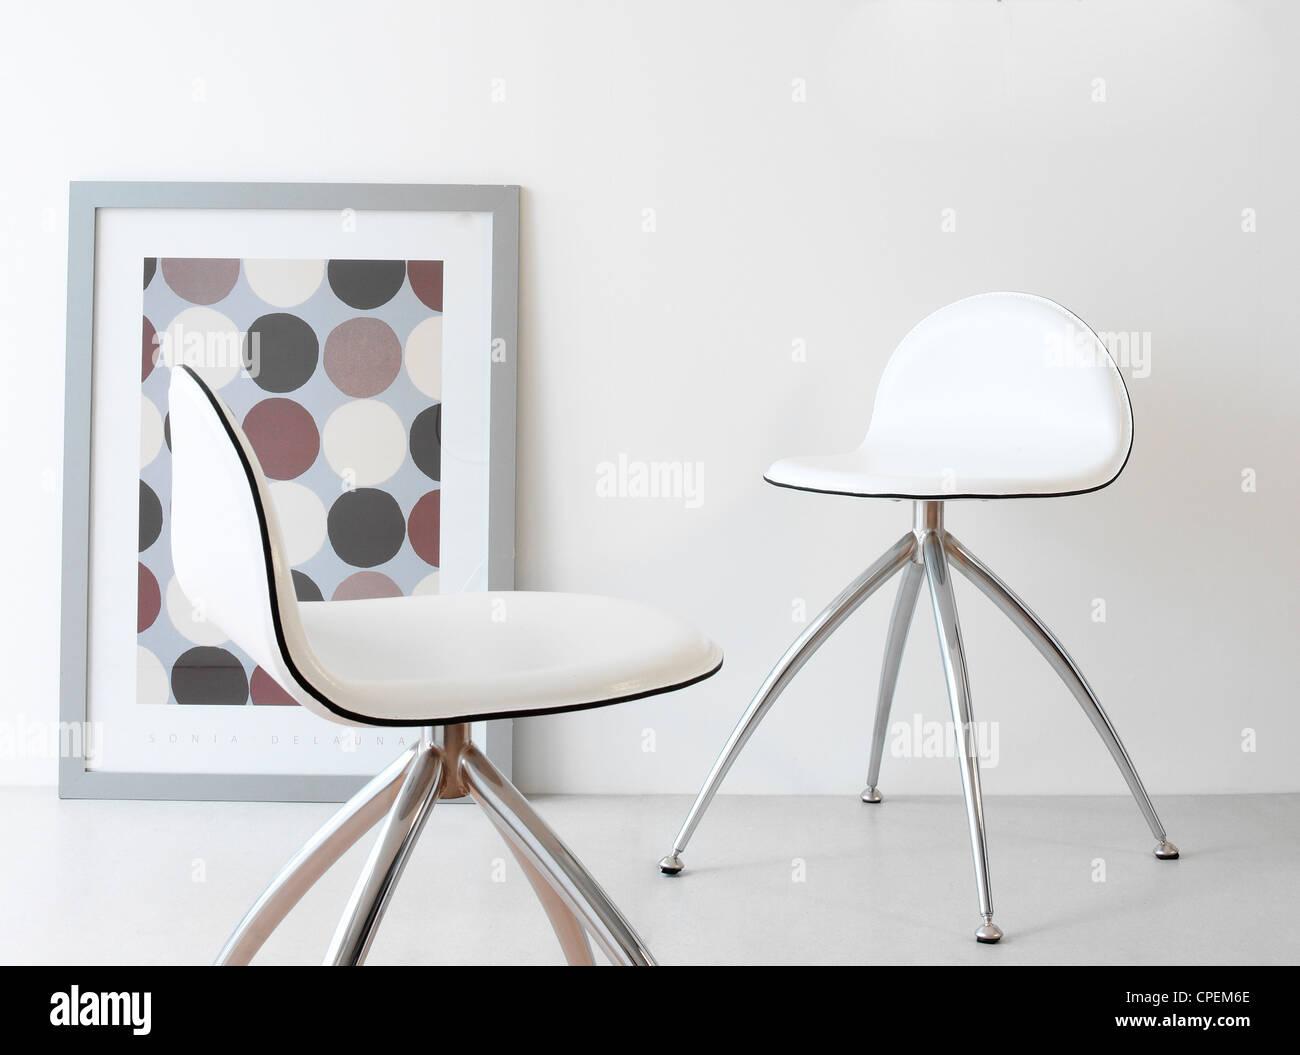 Stylish Chairs, Home Interior - Stock Image